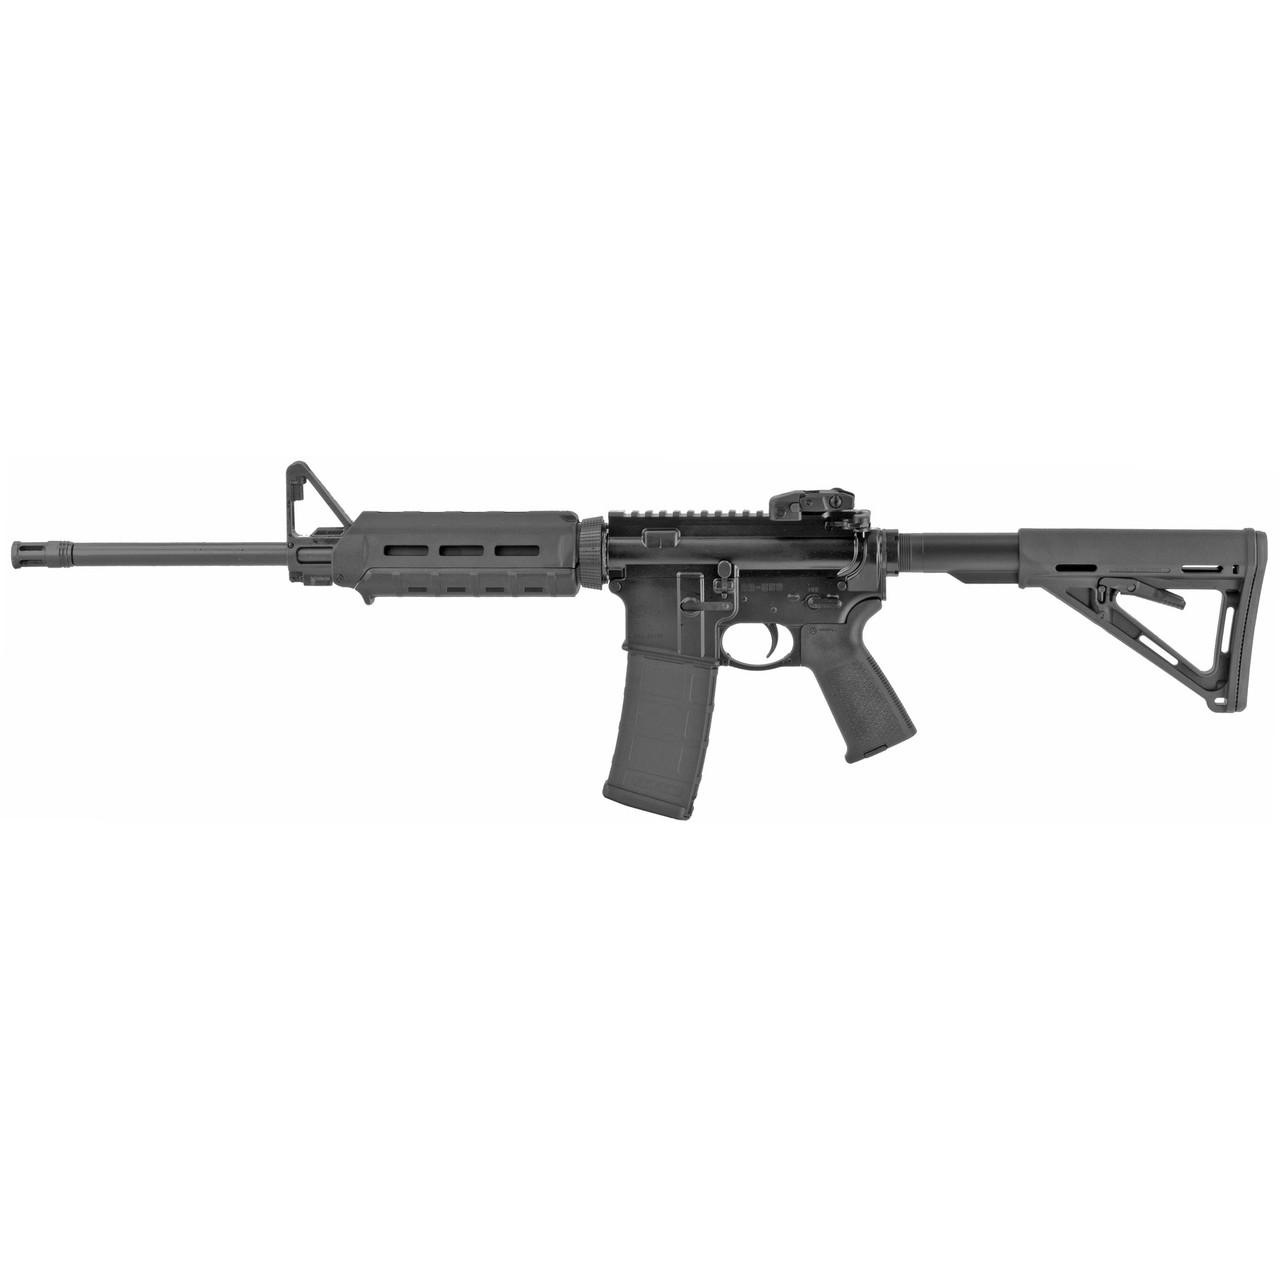 Ruger AR-556 MOE CALIFORNIA LEGAL - .223/5.56